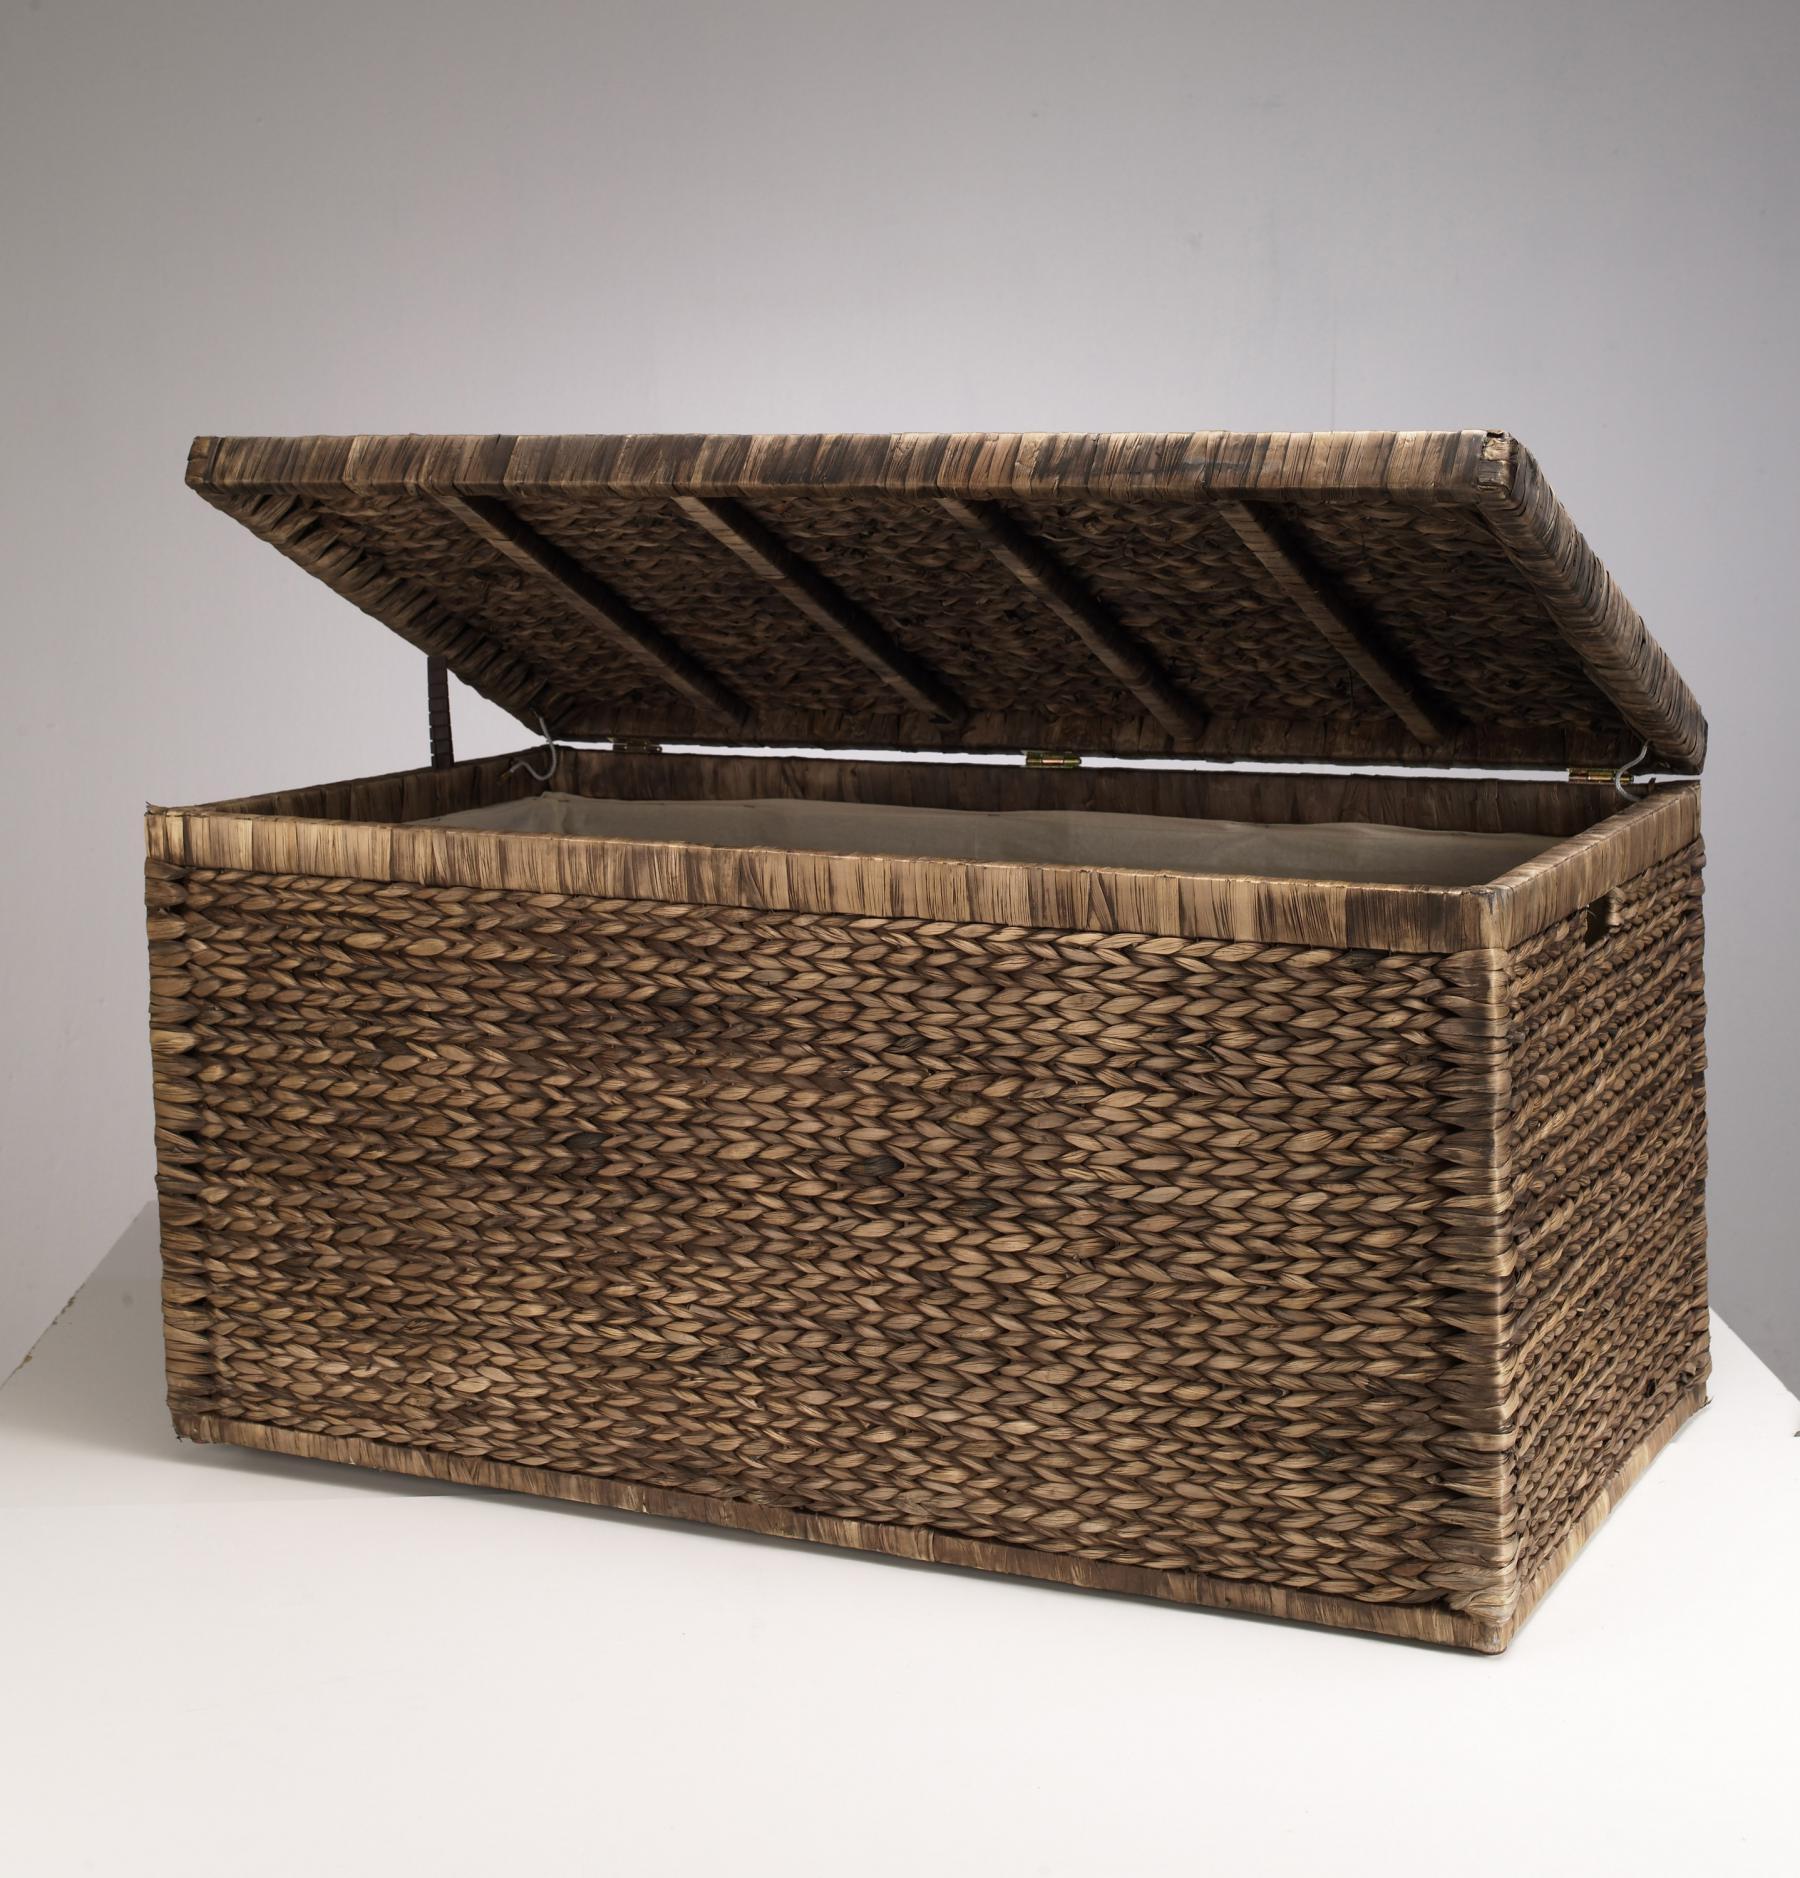 truhe mit klappdeckel braun 110 cm atmungsaktiv aufbewahrungsbox mit deckel aufbewahrungskiste. Black Bedroom Furniture Sets. Home Design Ideas